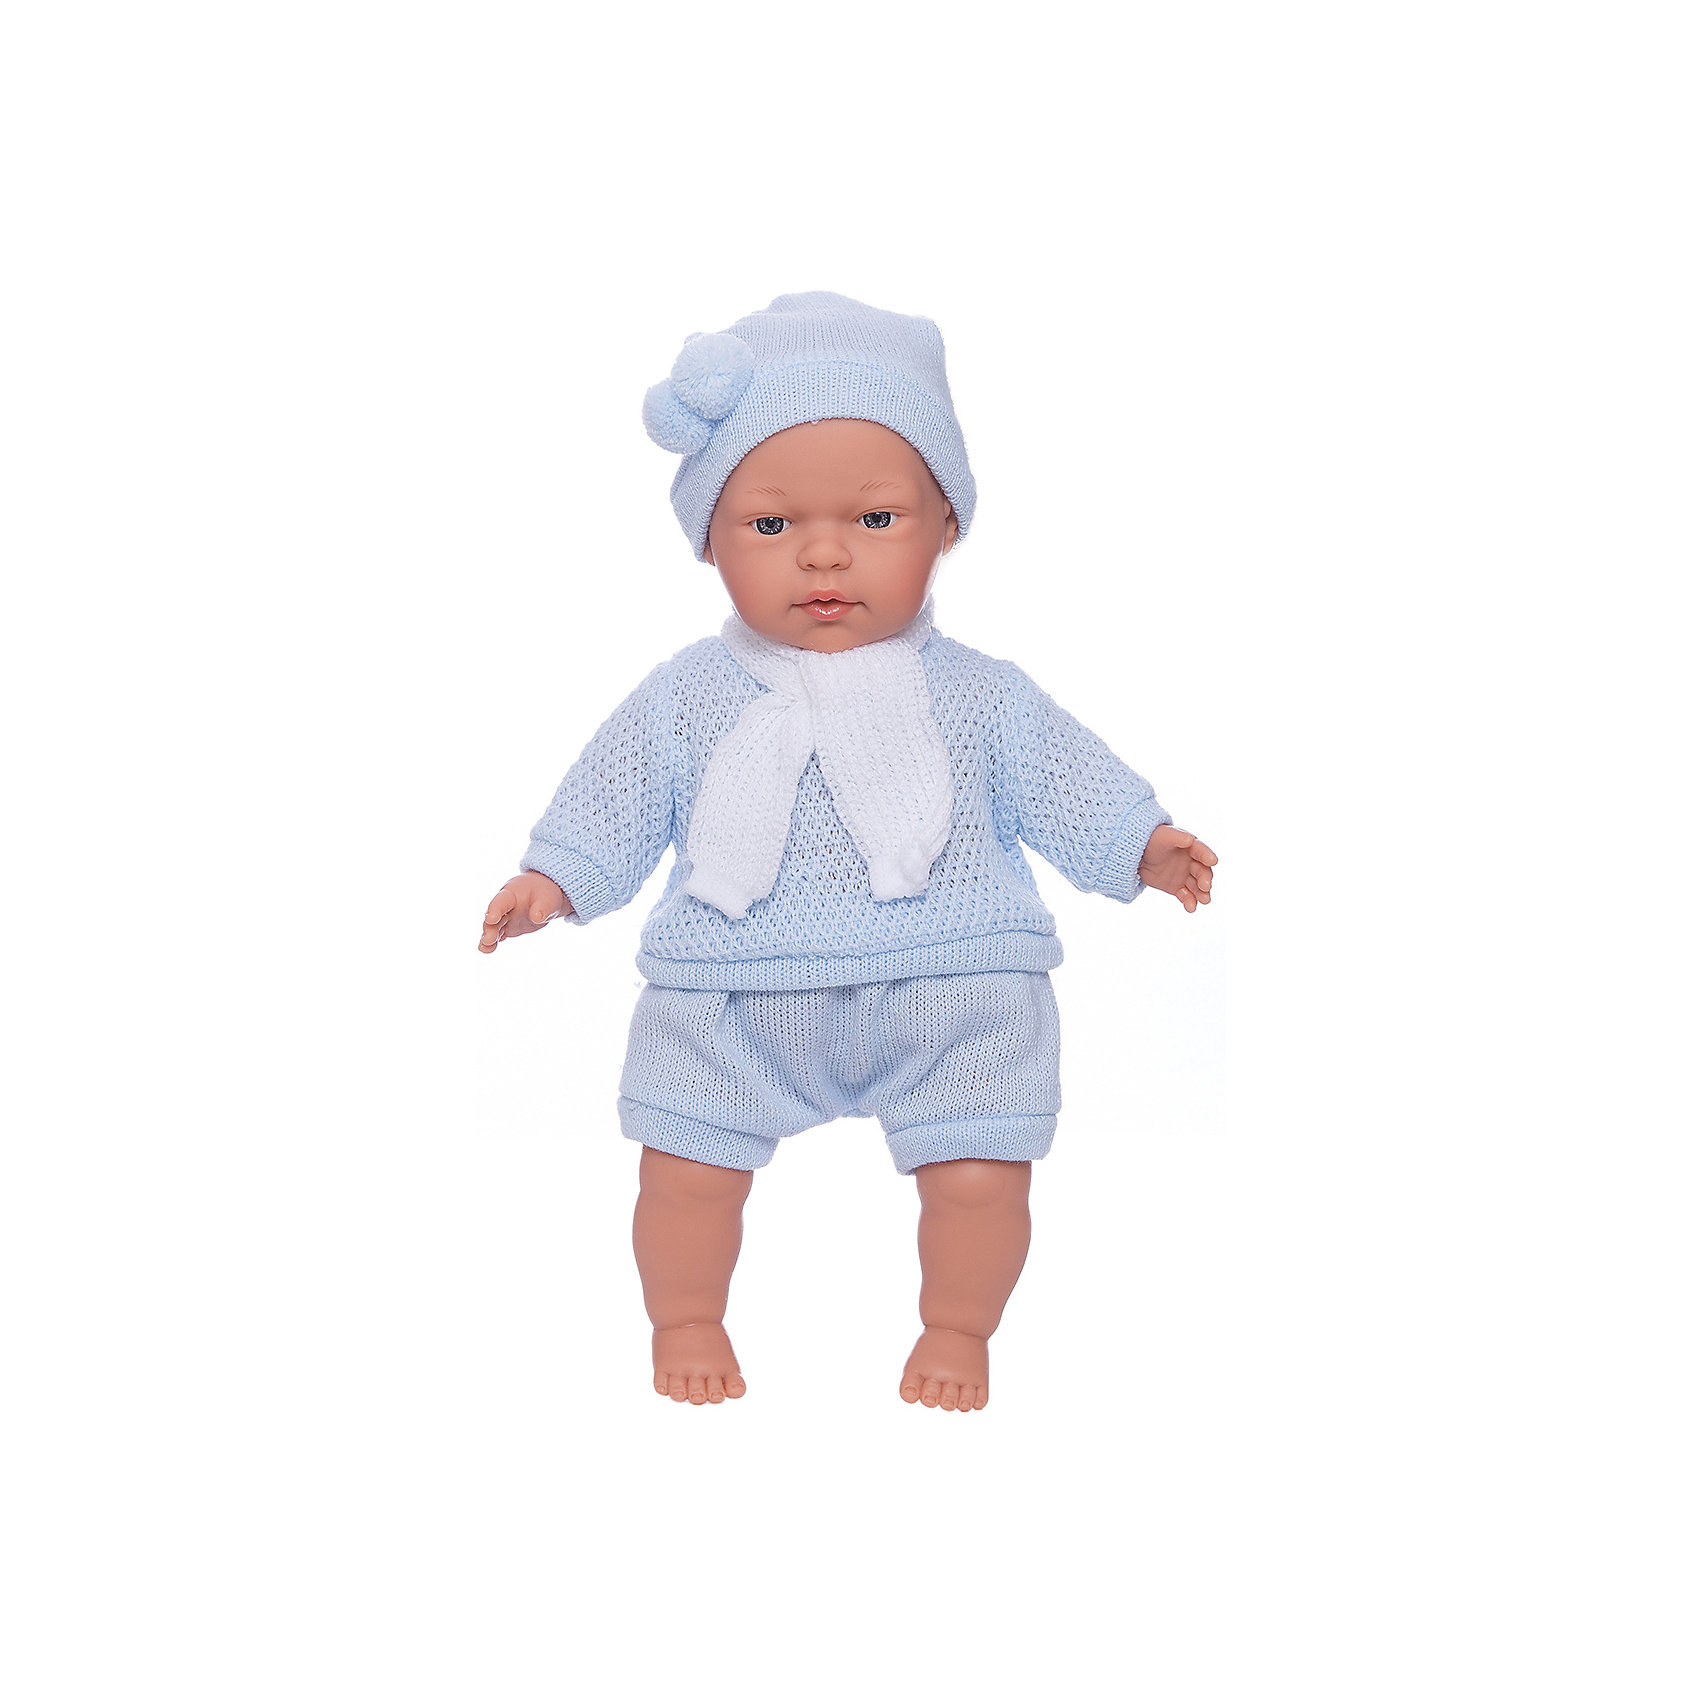 Llorens Кукла Павел, 33 см, Llorens куклы и одежда для кукол llorens кукла изабела 33 см со звуком